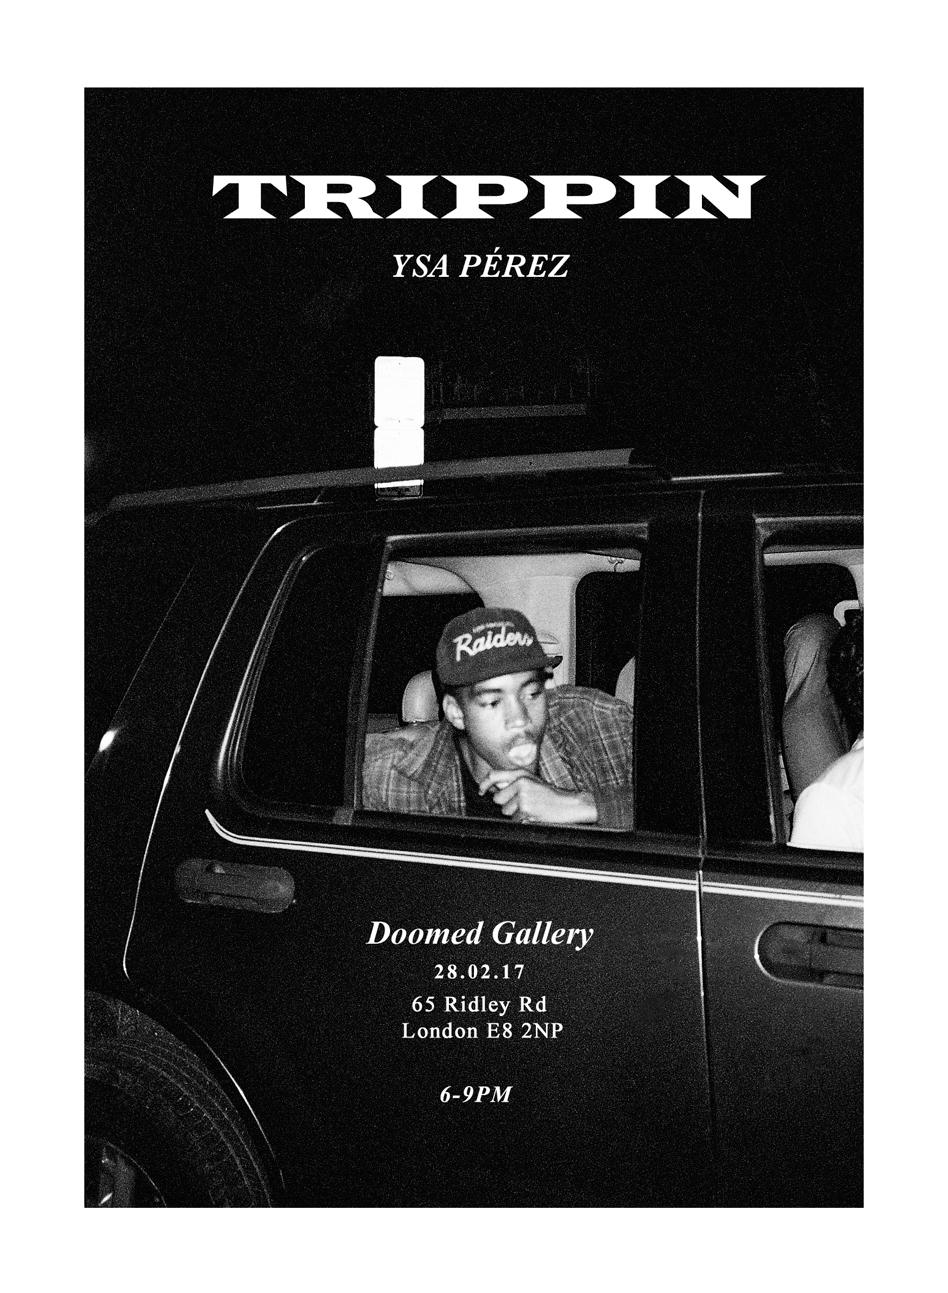 'TRIPPIN'